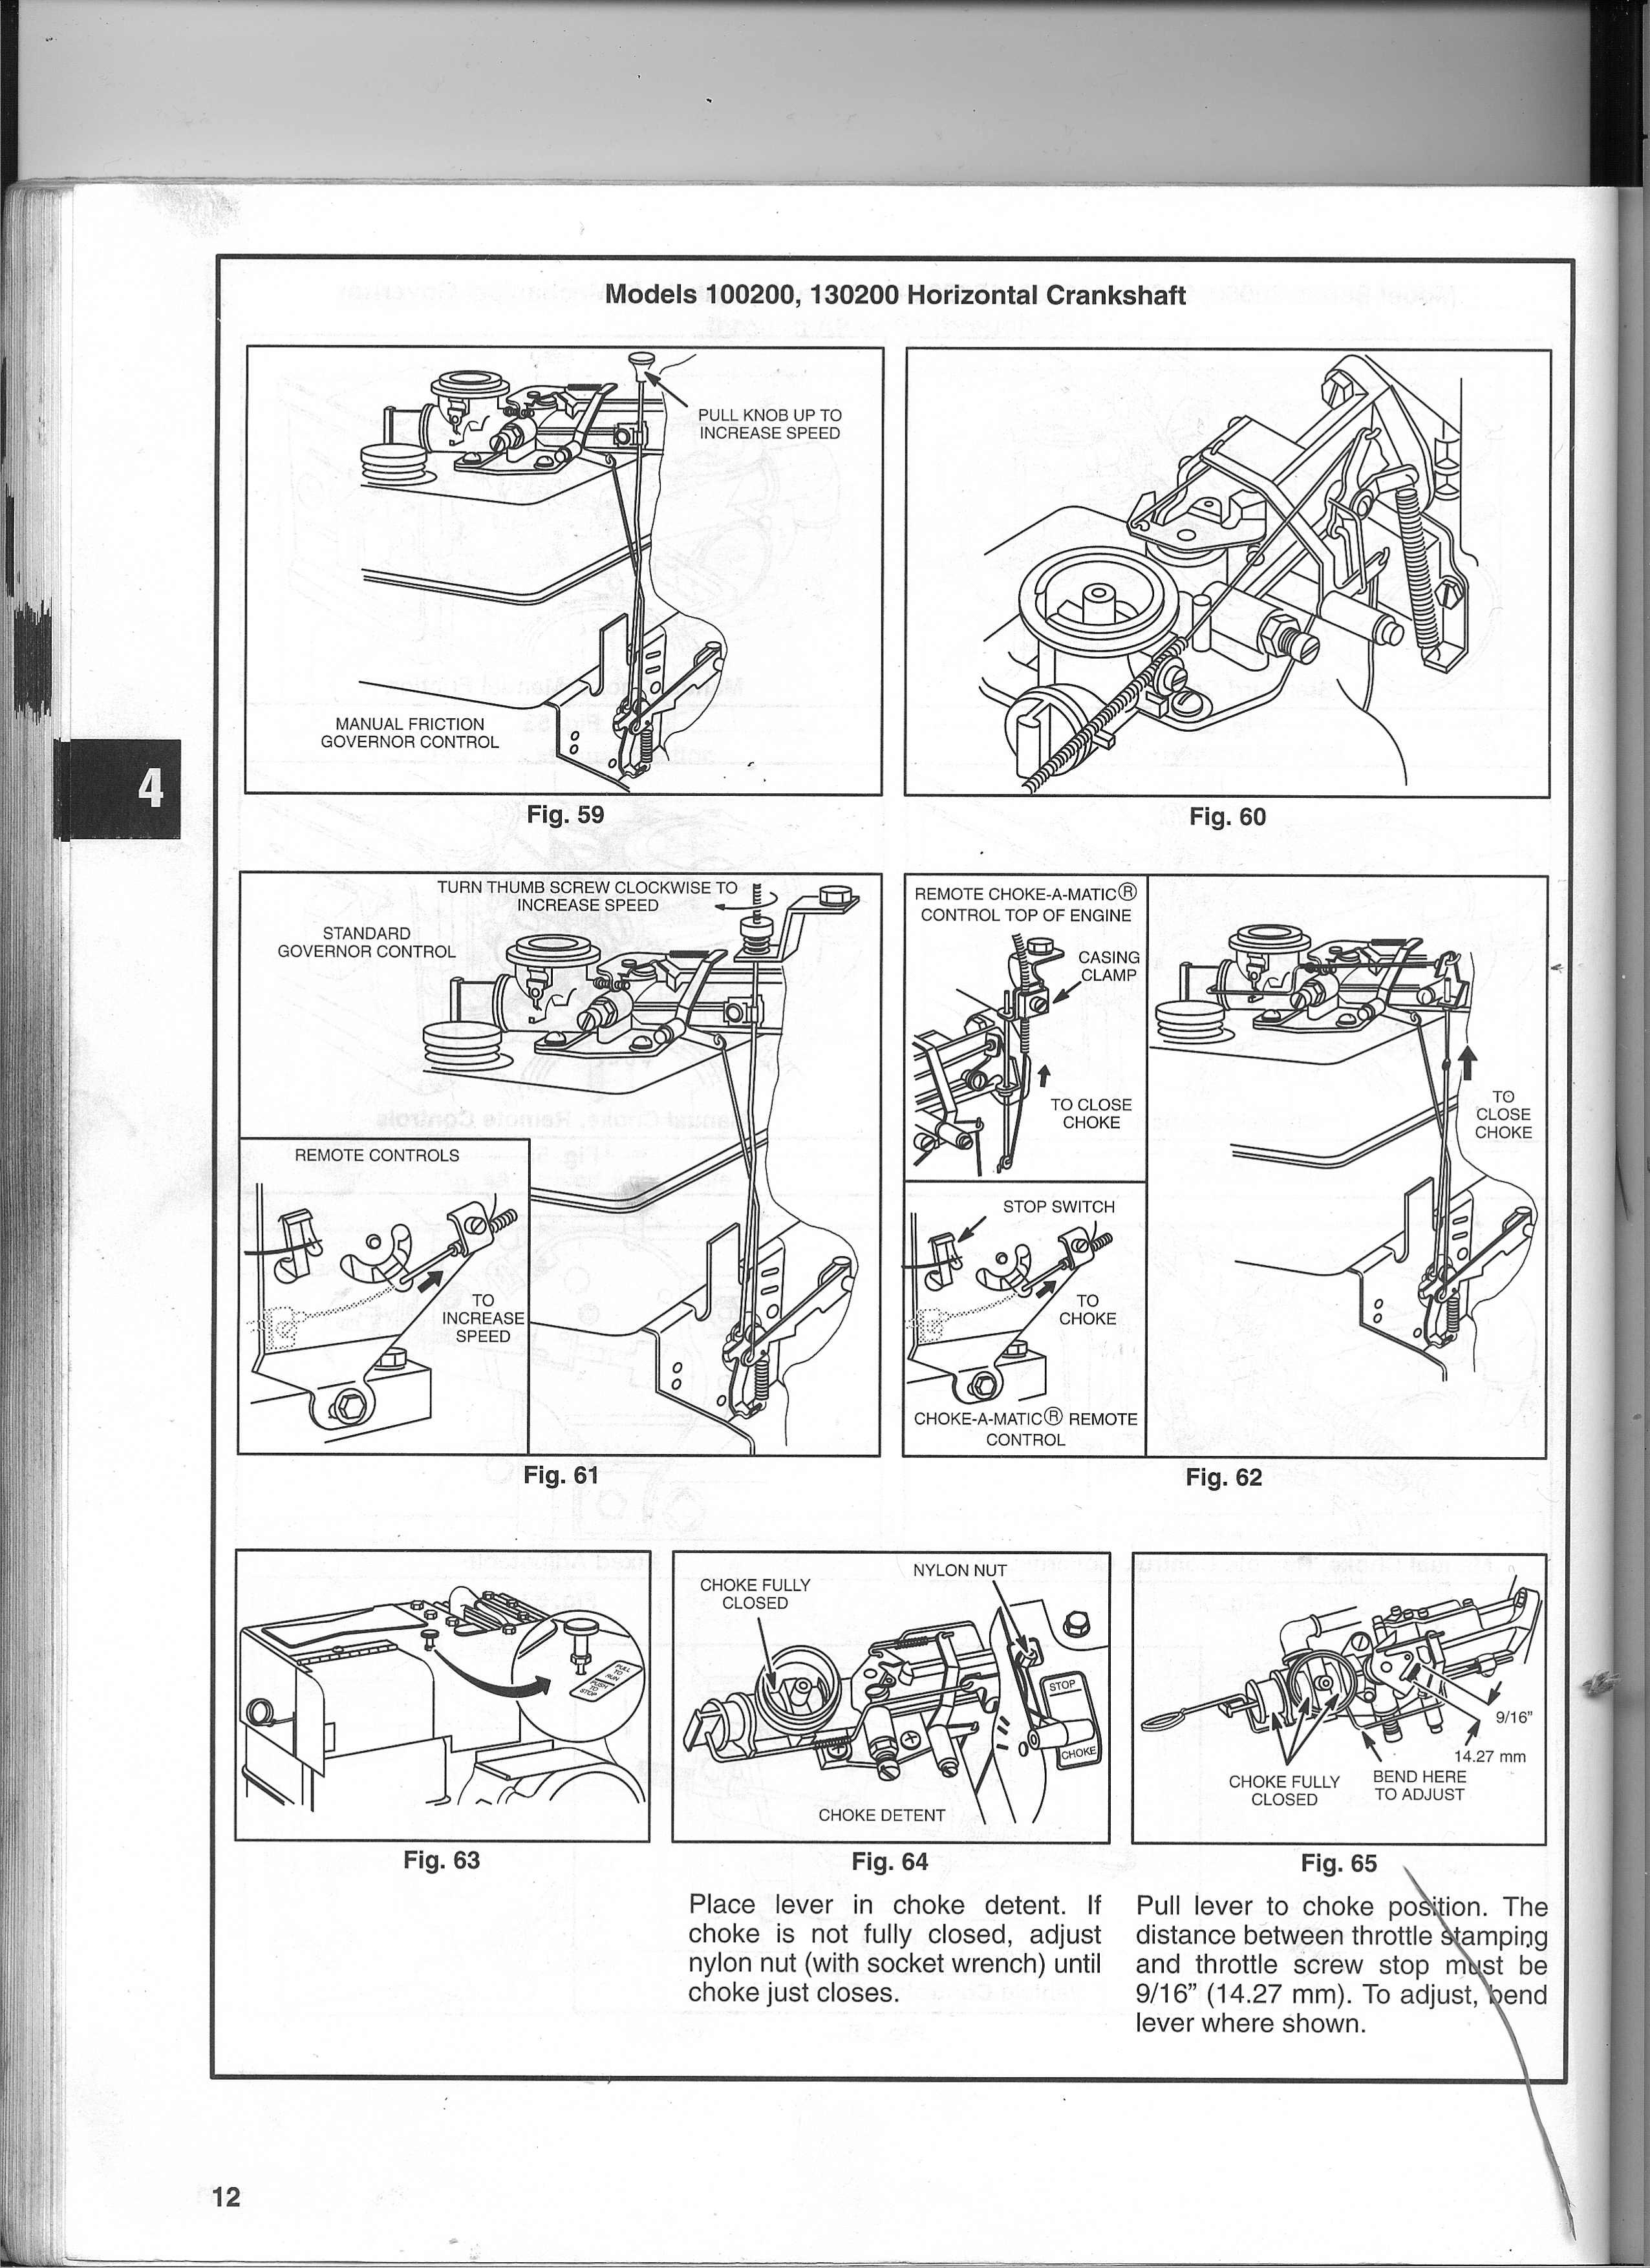 135202 manual rh 135202 manual elzplorers de Briggs Stratton Model 135202  Briggs and Stratton 135202 Diagram